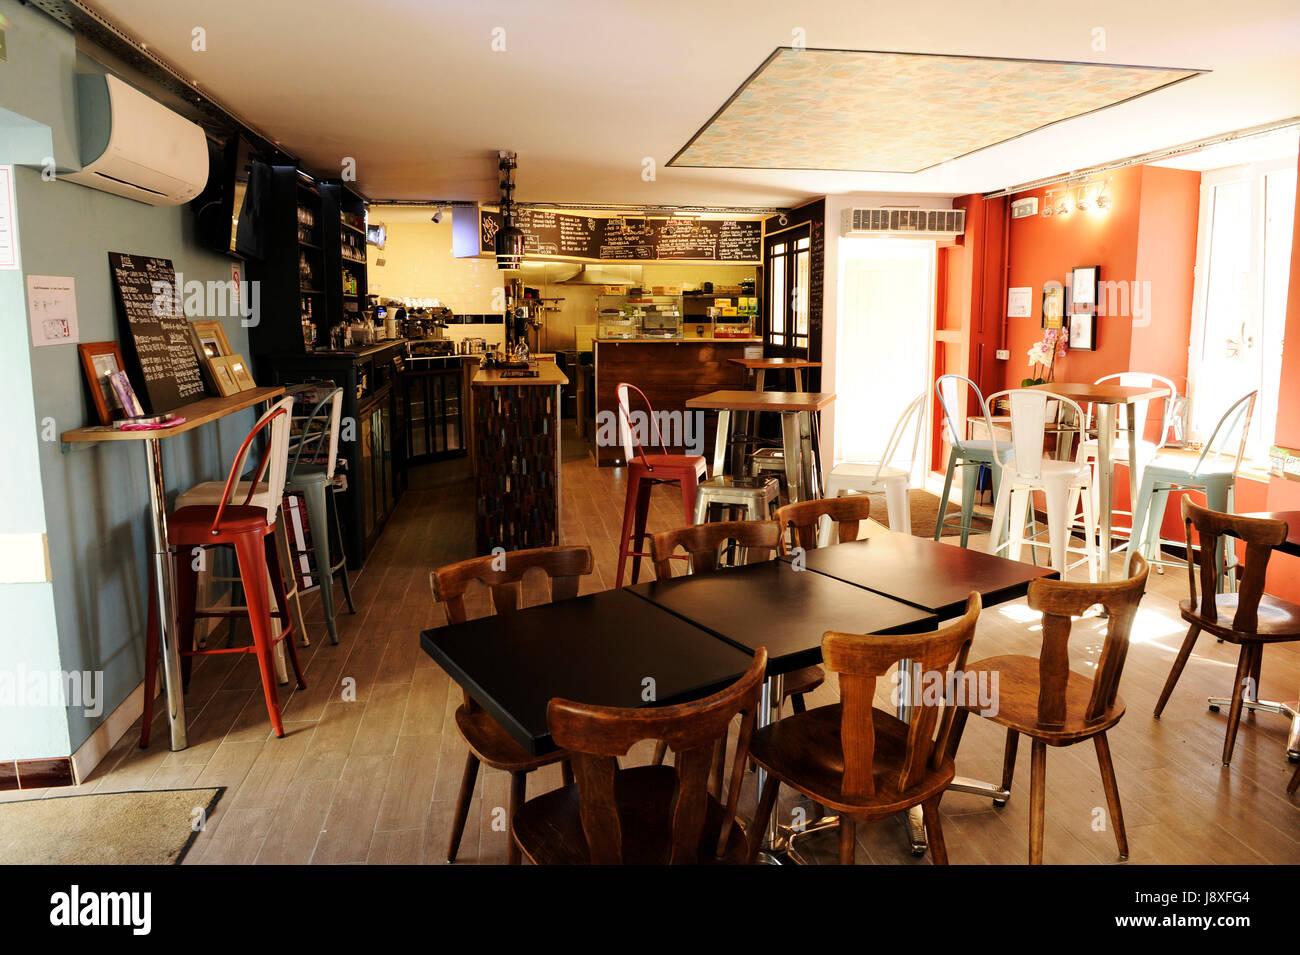 Cafe Creme, Cleguerec, Morbihan, Brittany. 23 August 2016. Copyright Warren James Palmer. www.wjpphoto.co.uk 0044 - Stock Image